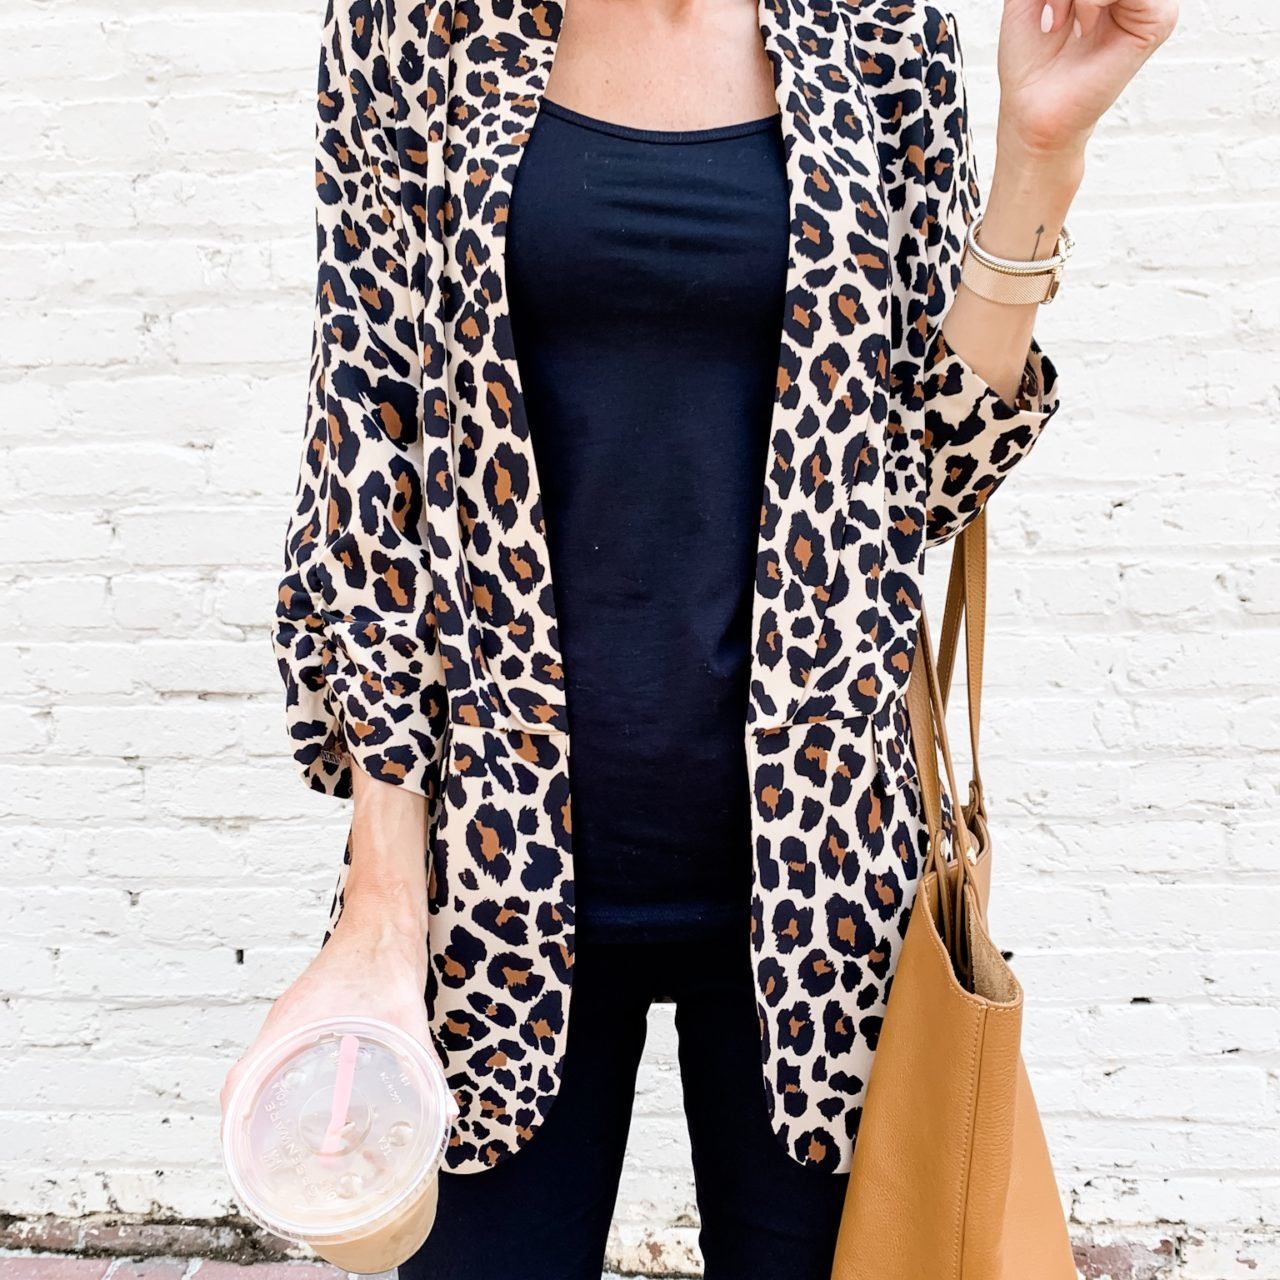 Leopard Print Blazer for Work